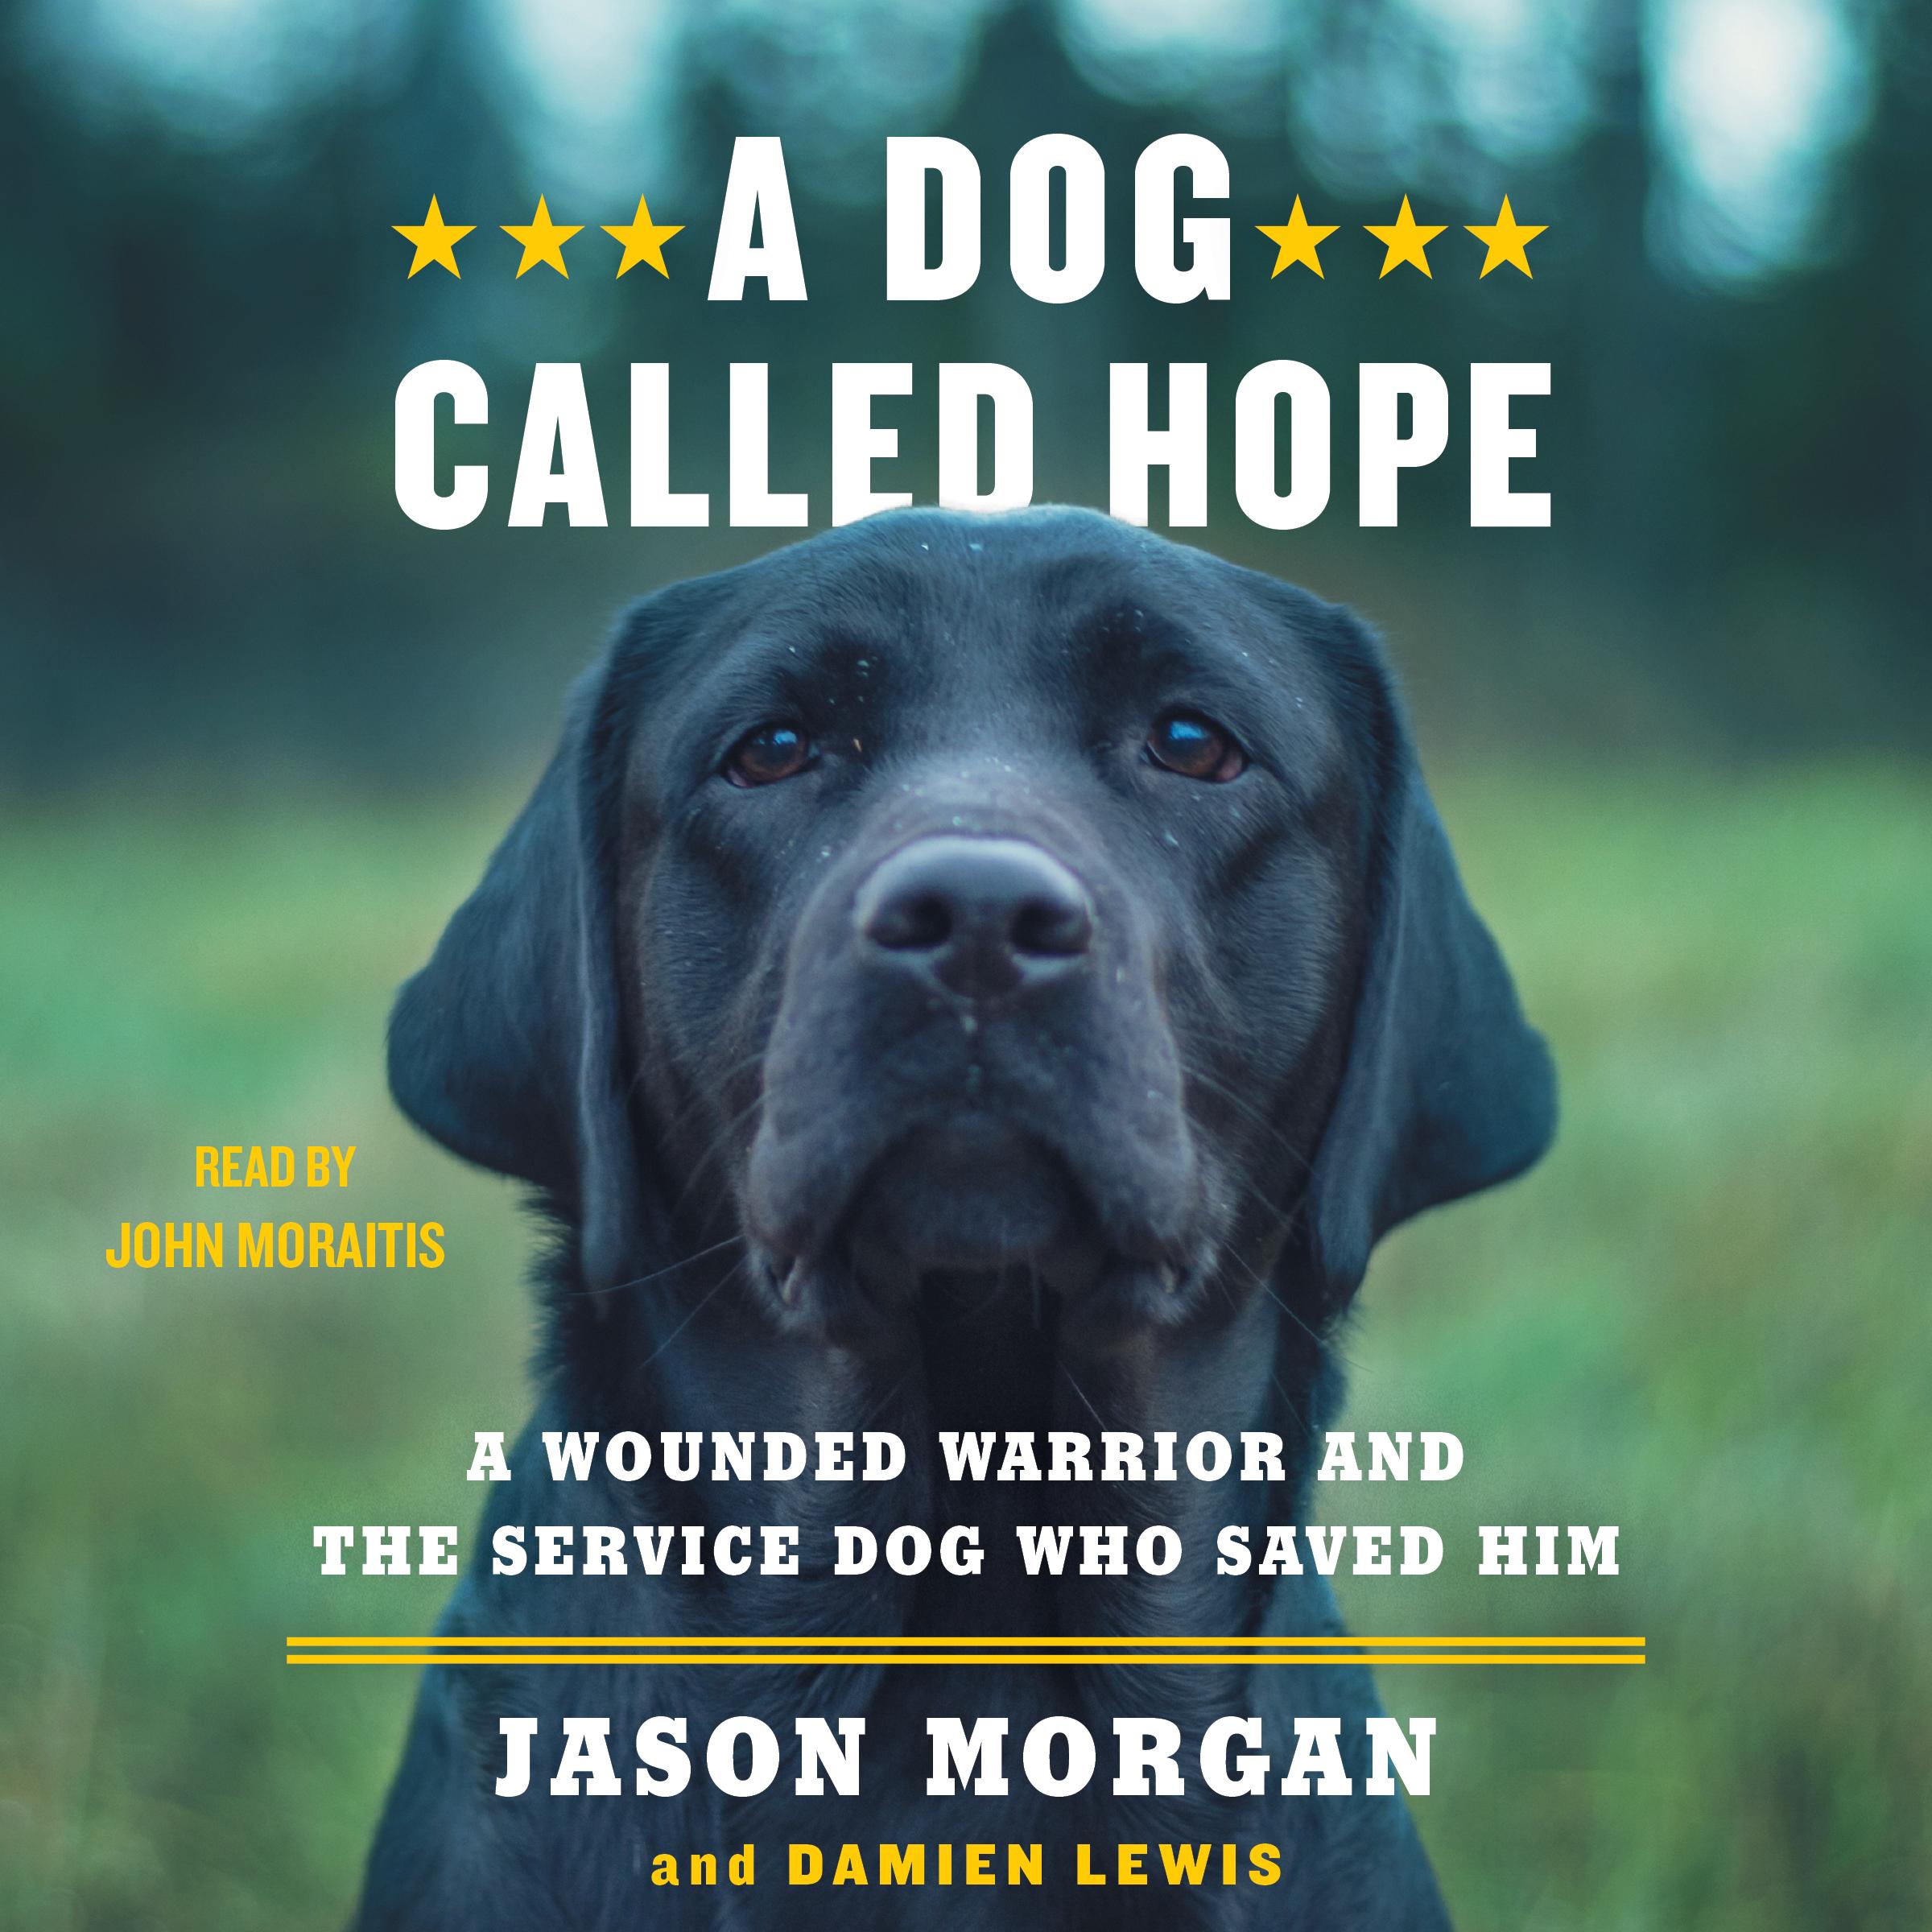 A dog called hope 9781508237921 hr